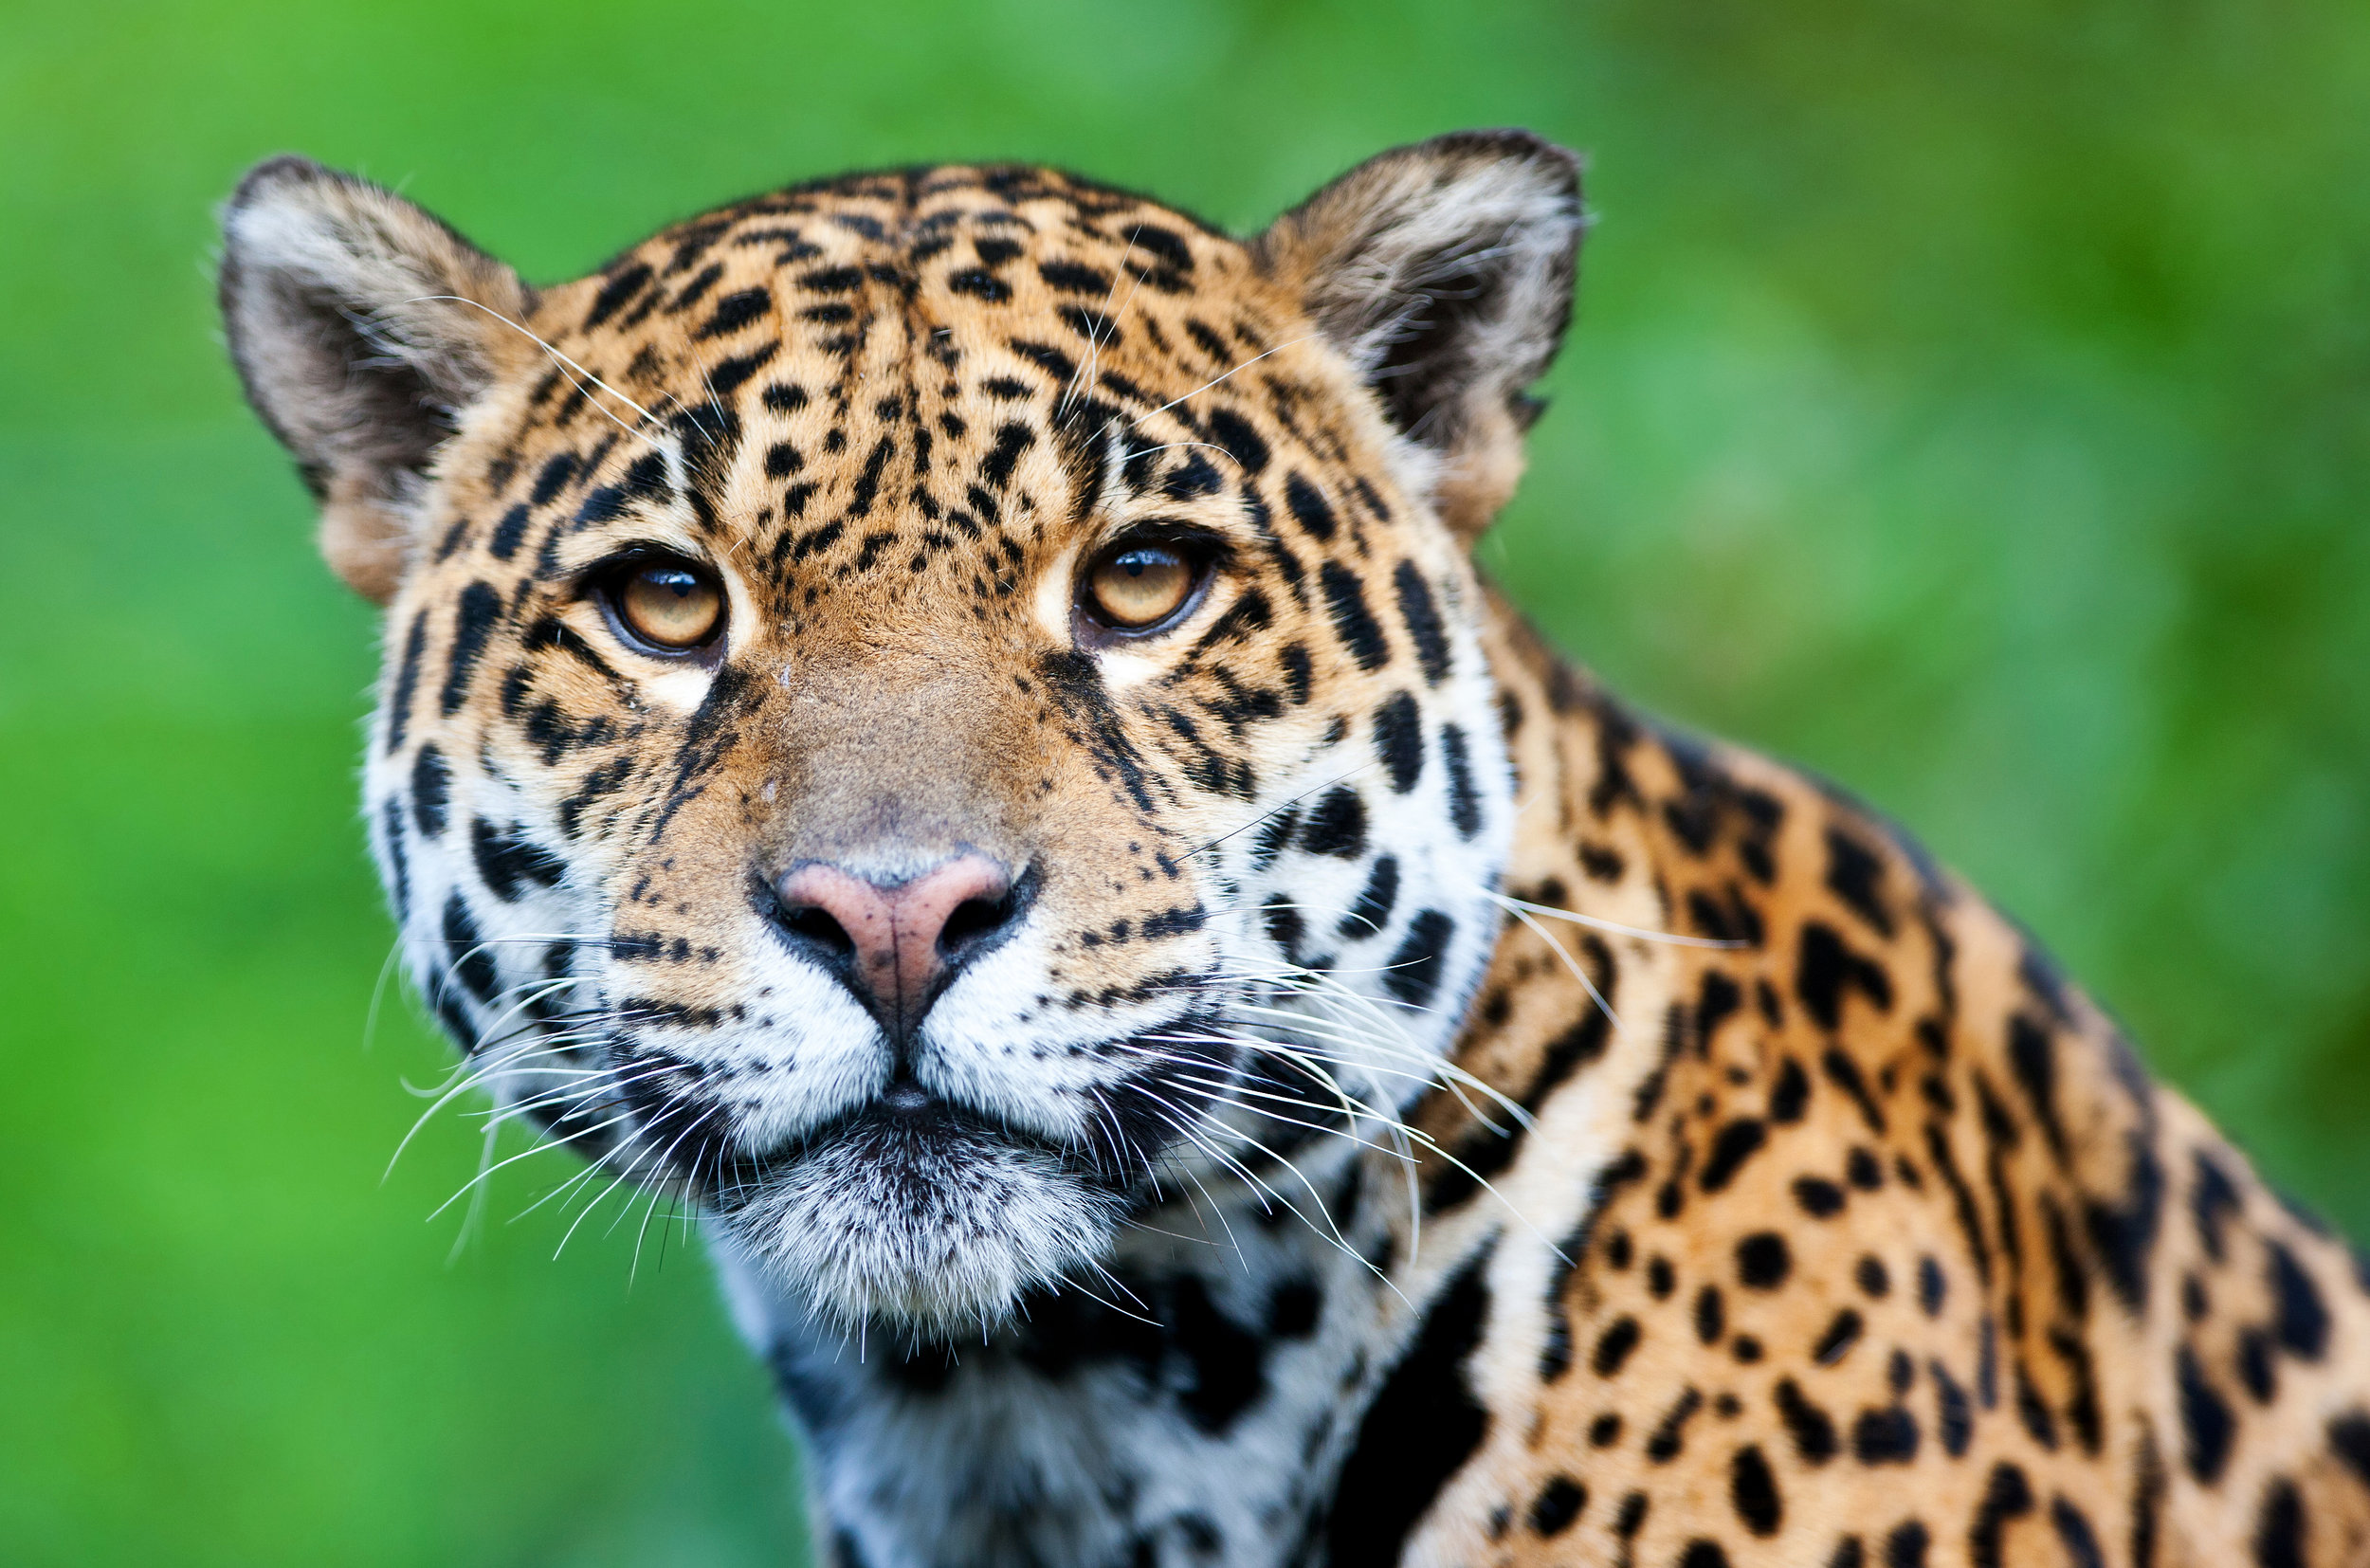 Jaguar in Pantanal, Brazilian Amazon